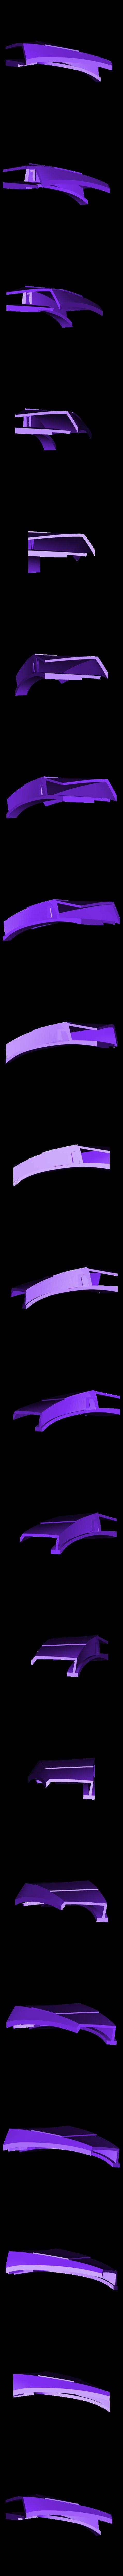 Part 5 v1.stl Download STL file ARF Trooper Helmet • 3D print object, VillainousPropShop